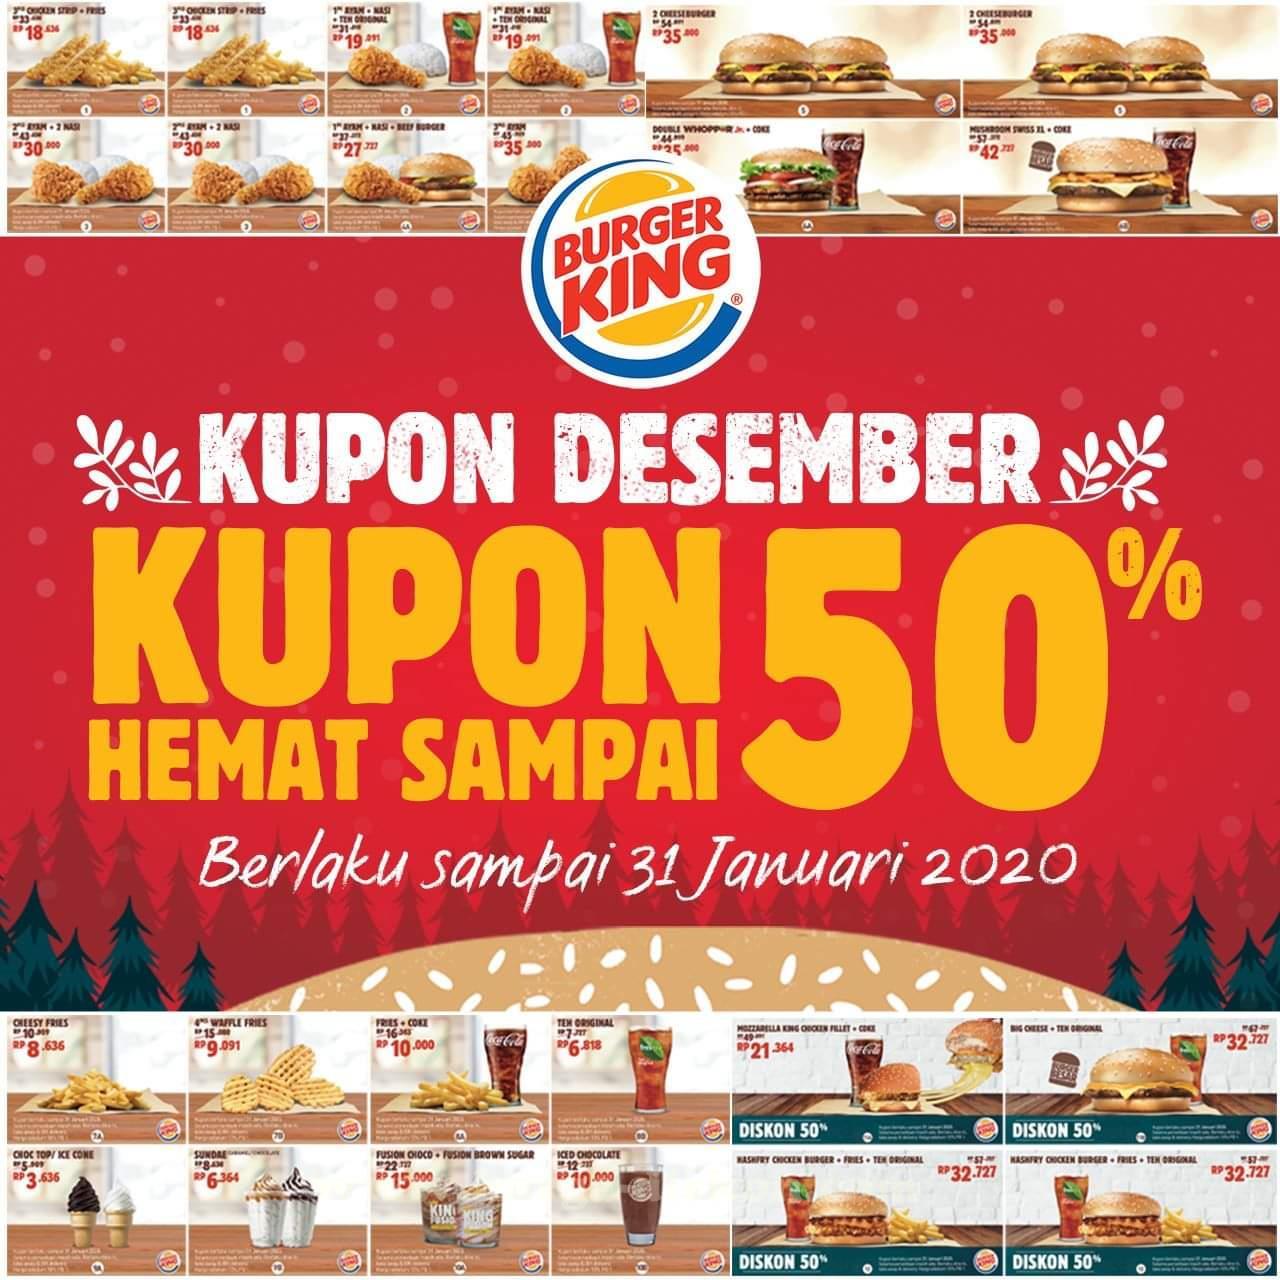 Promo Burger King Terbaru Kupon Desember 2019 Hemat Hingga 50 Harga Diskon